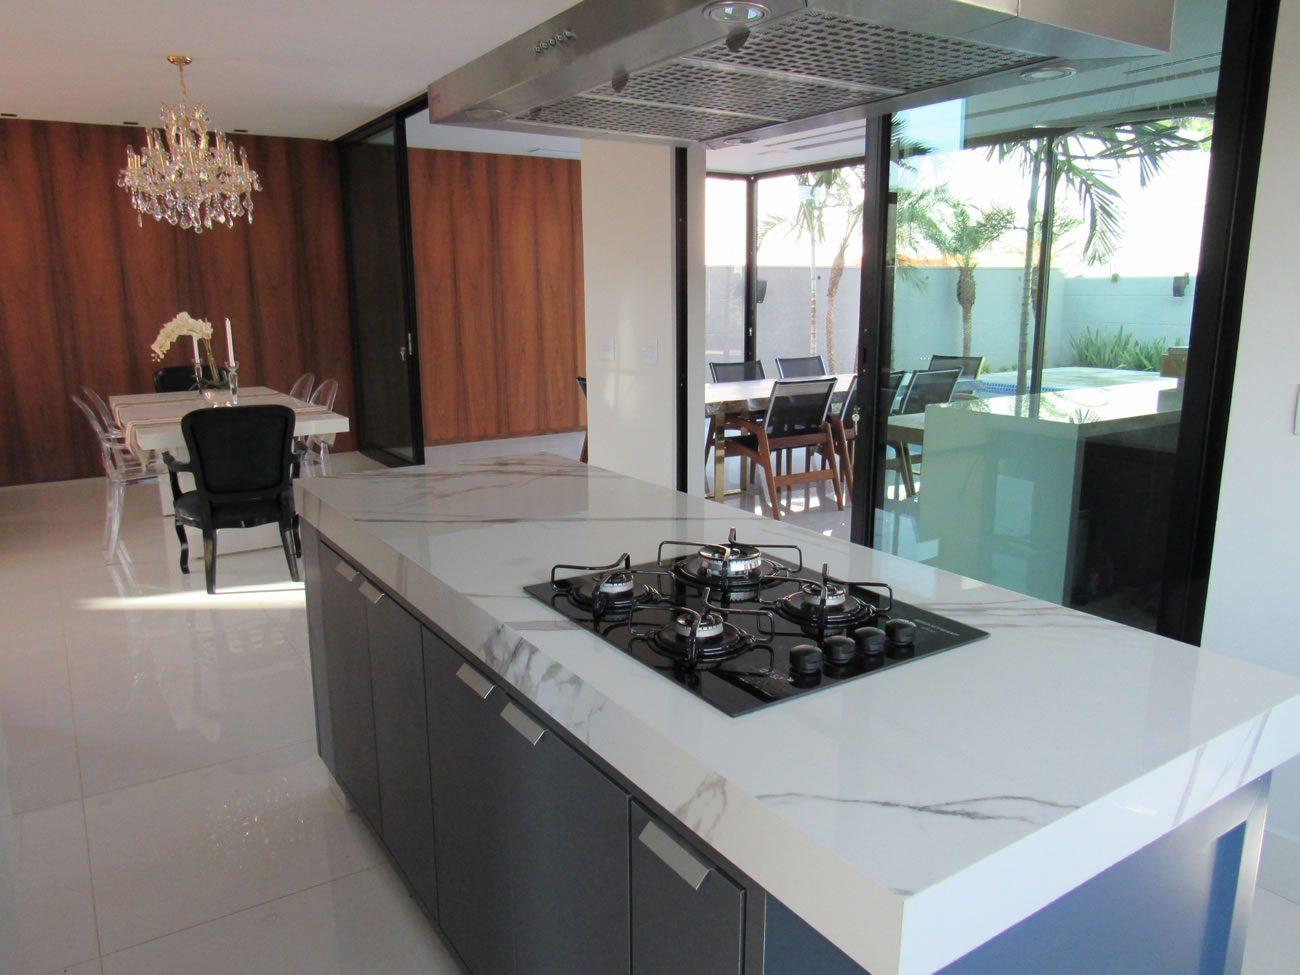 Ambiente Eliane: fabio-martins-arquiteto-marmo-branco-po-120x240cm-amb-01